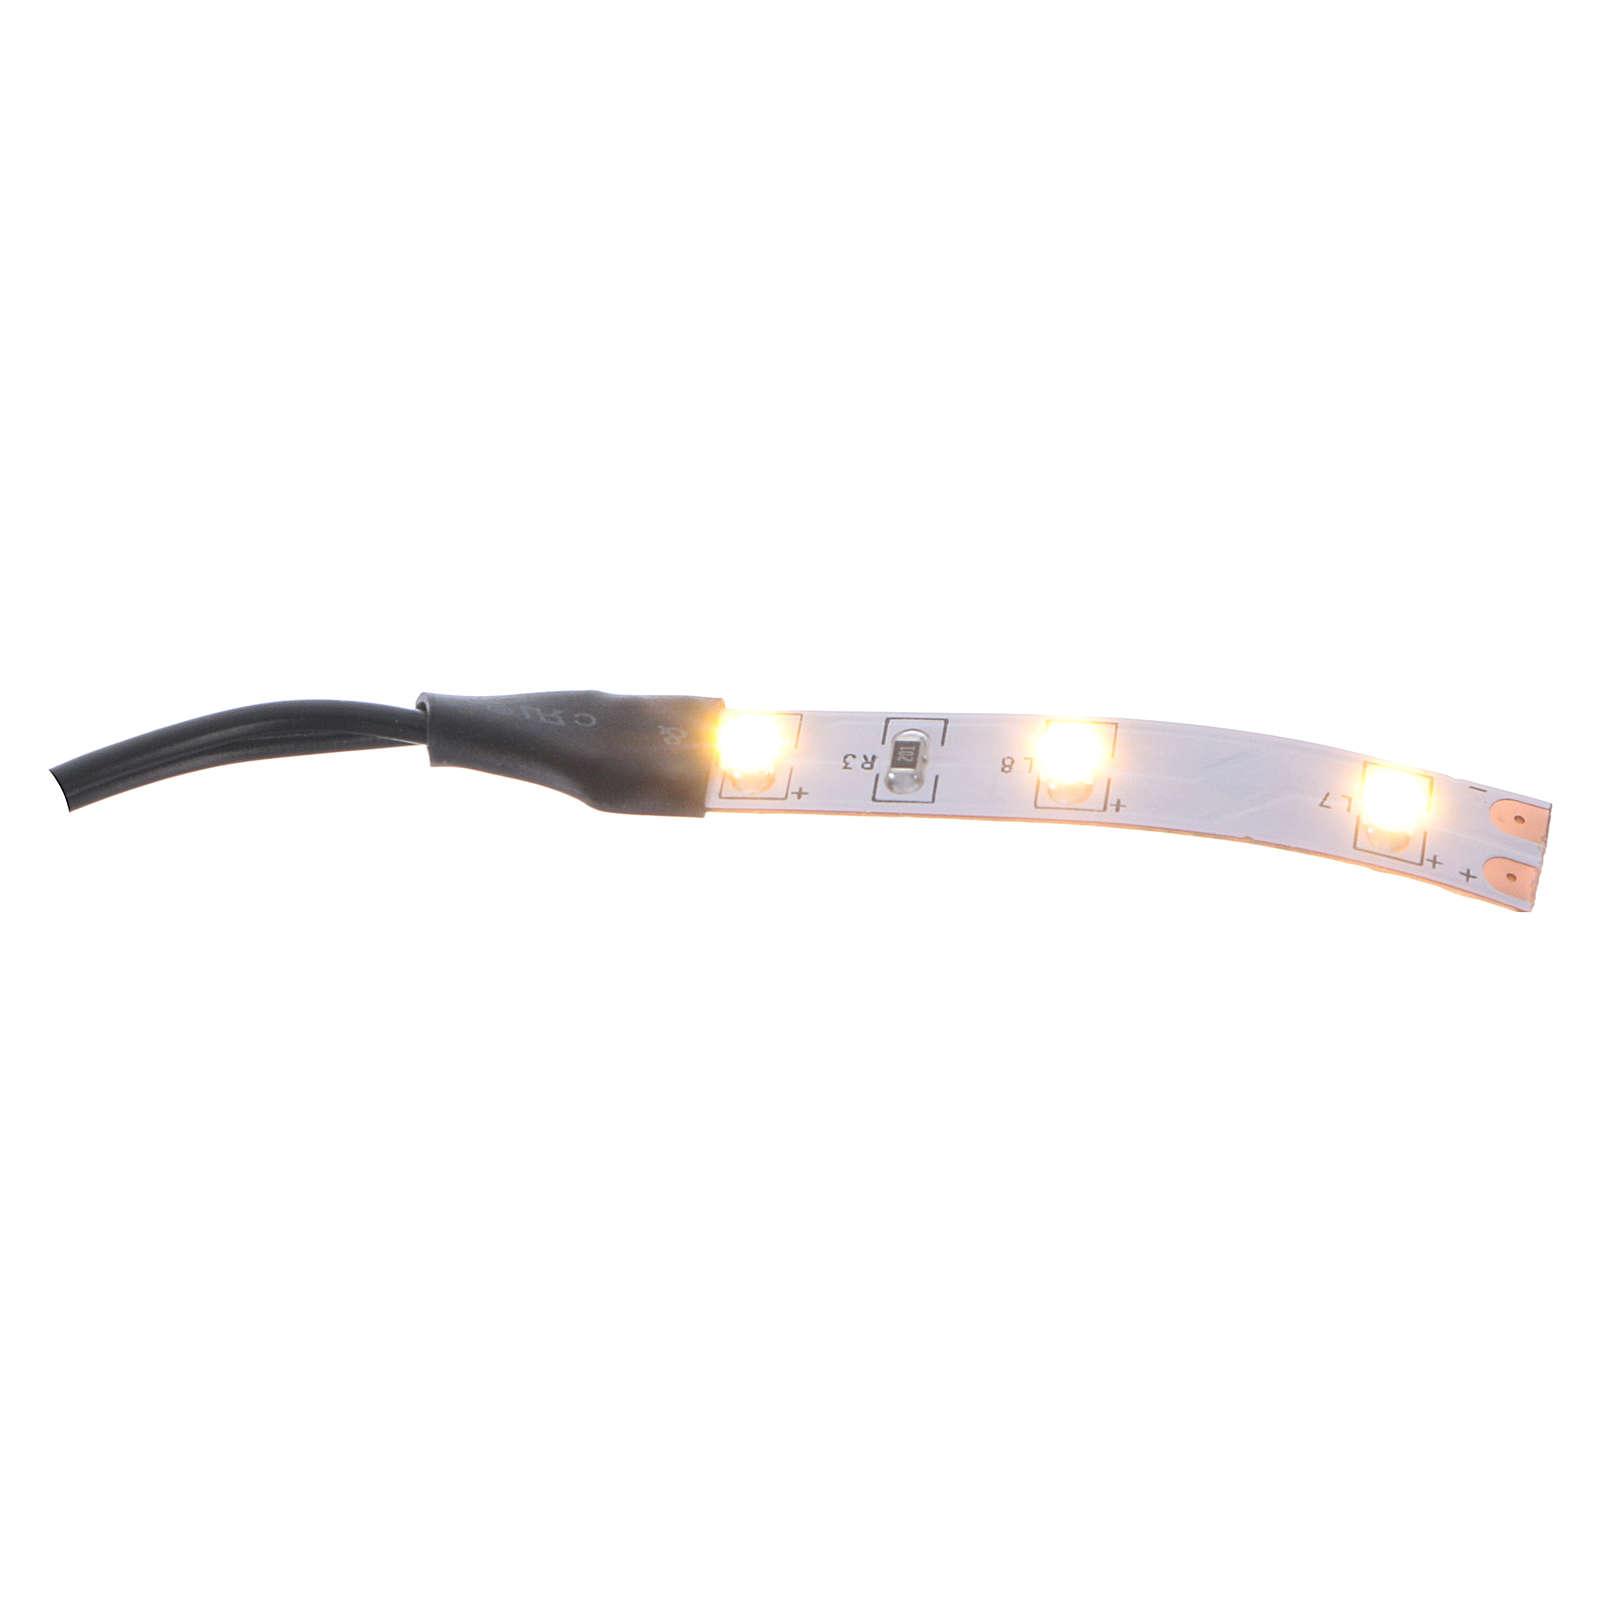 Led a strisce 3 led cm 0,8x4 cm bianca calda per Frisalight 4